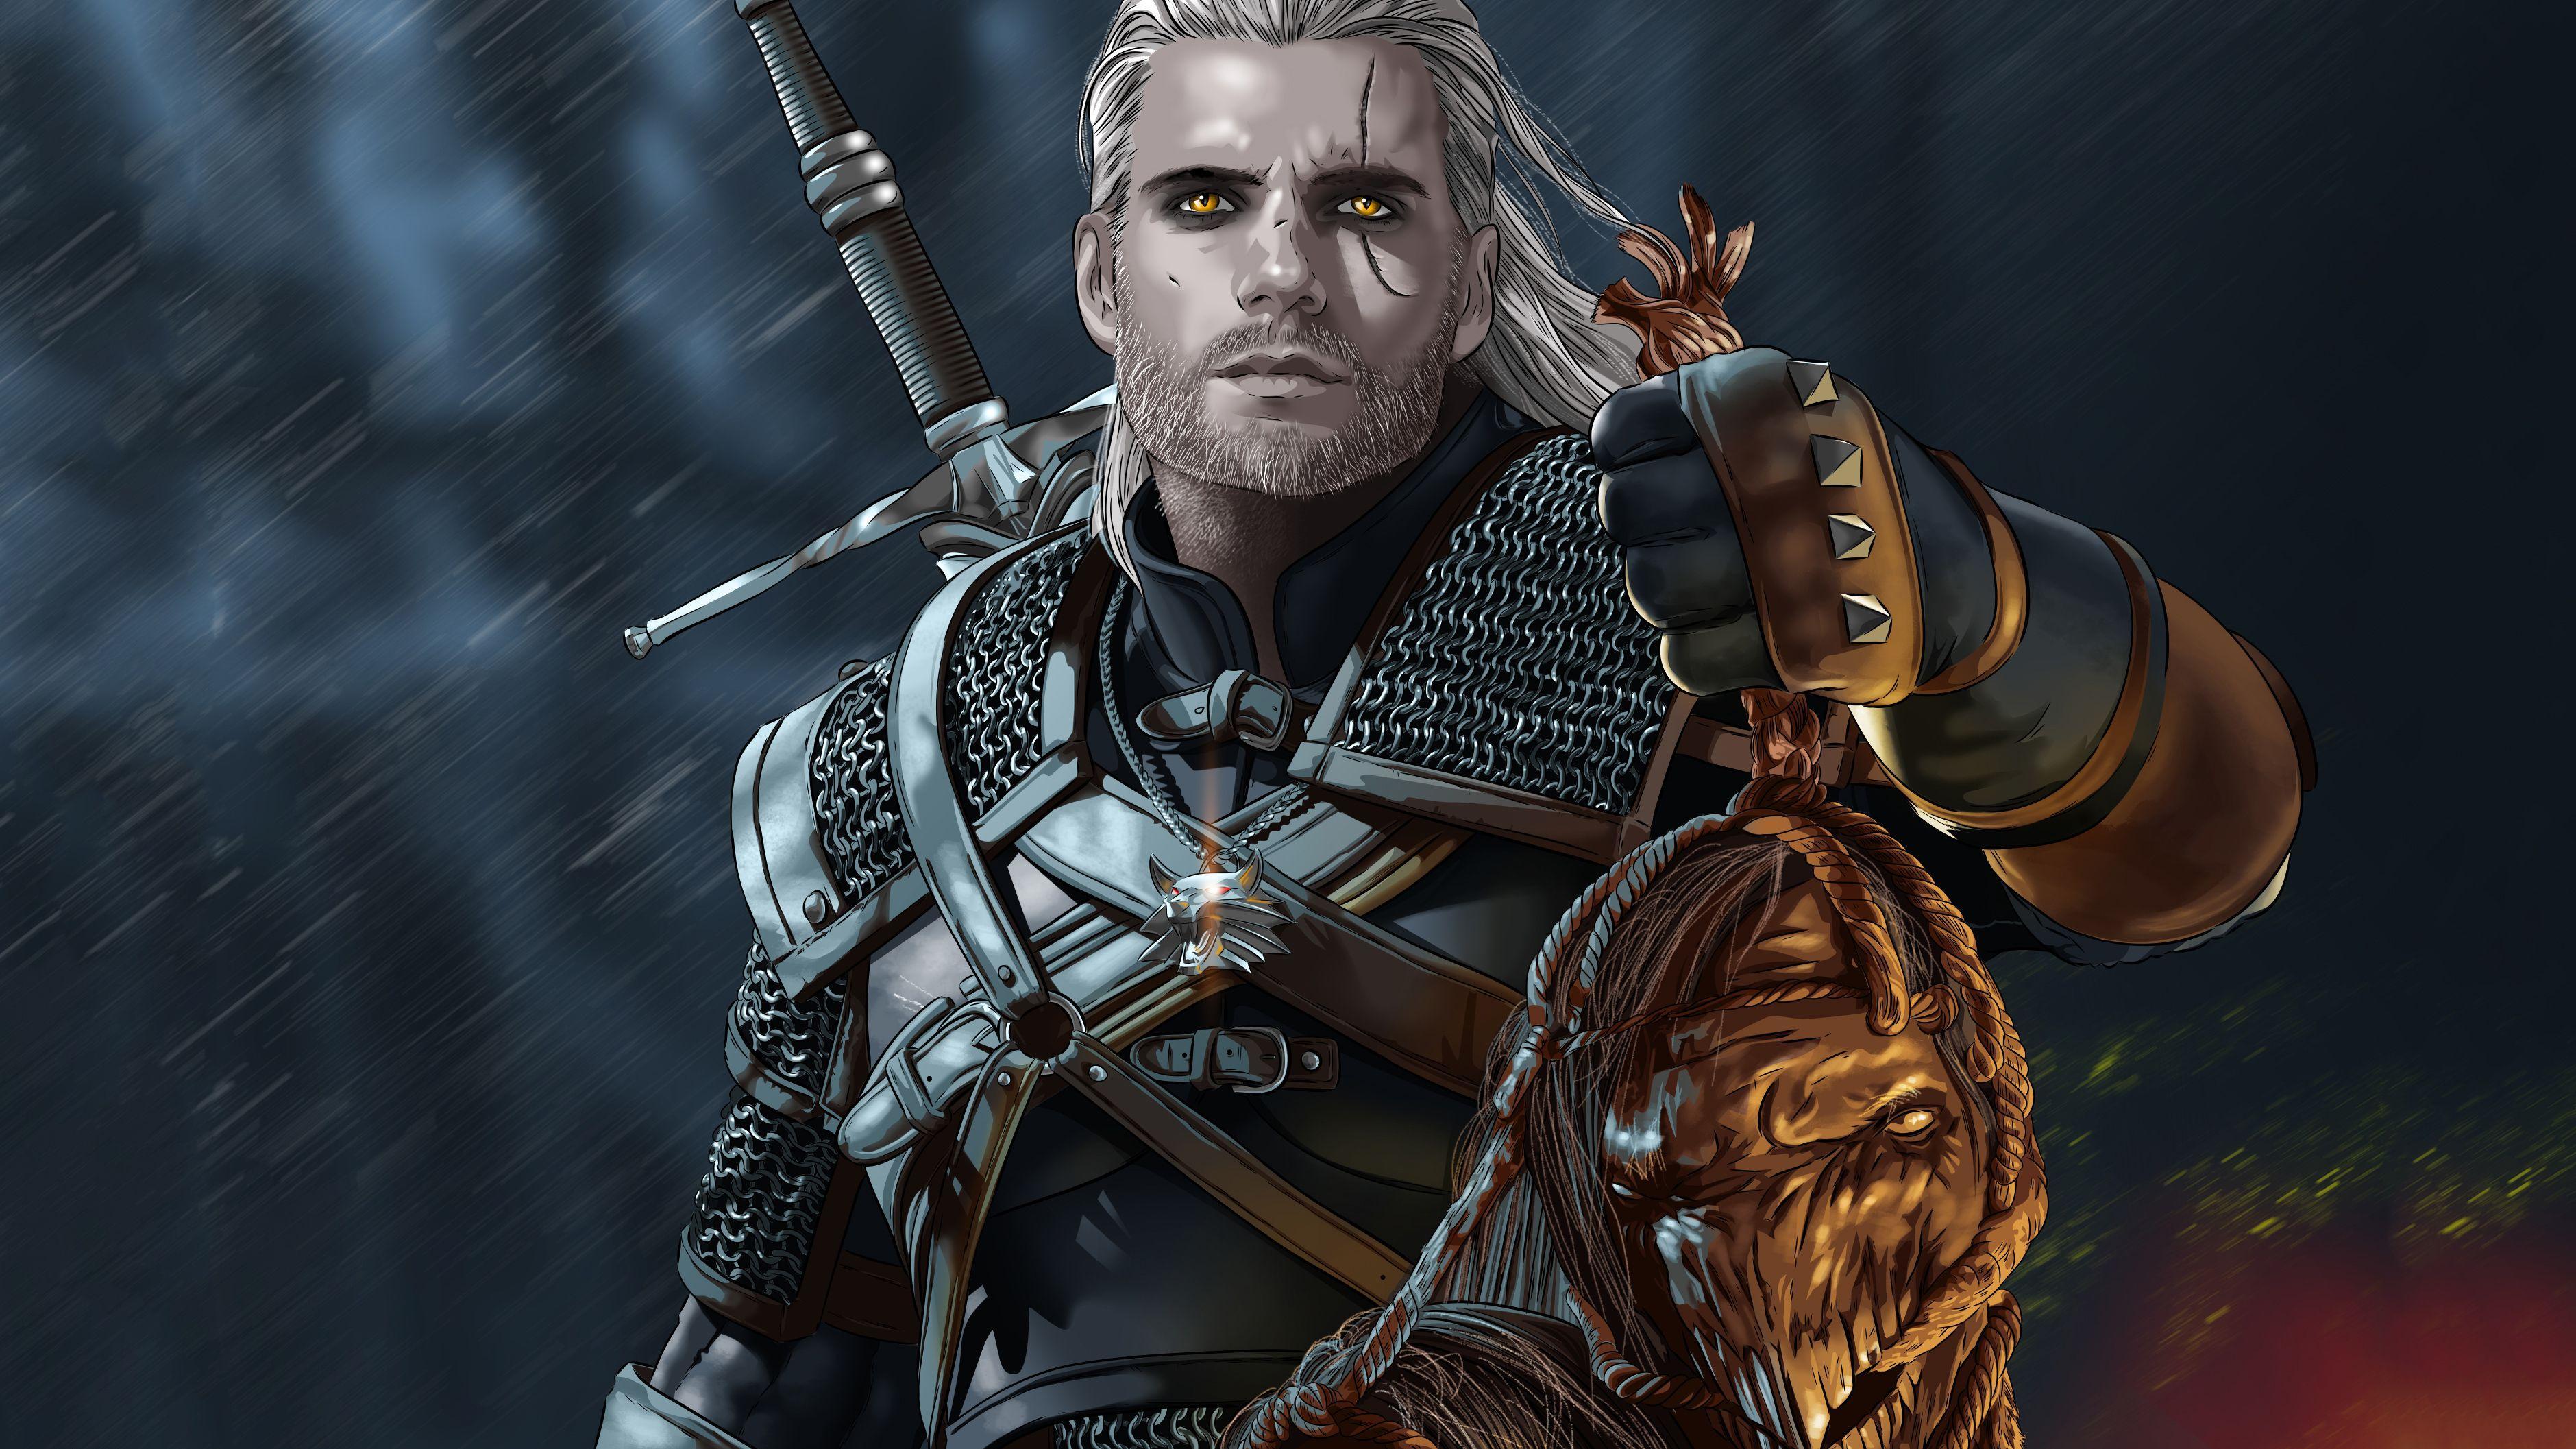 Geralt Of Rivia Wallpapers Top Free Geralt Of Rivia